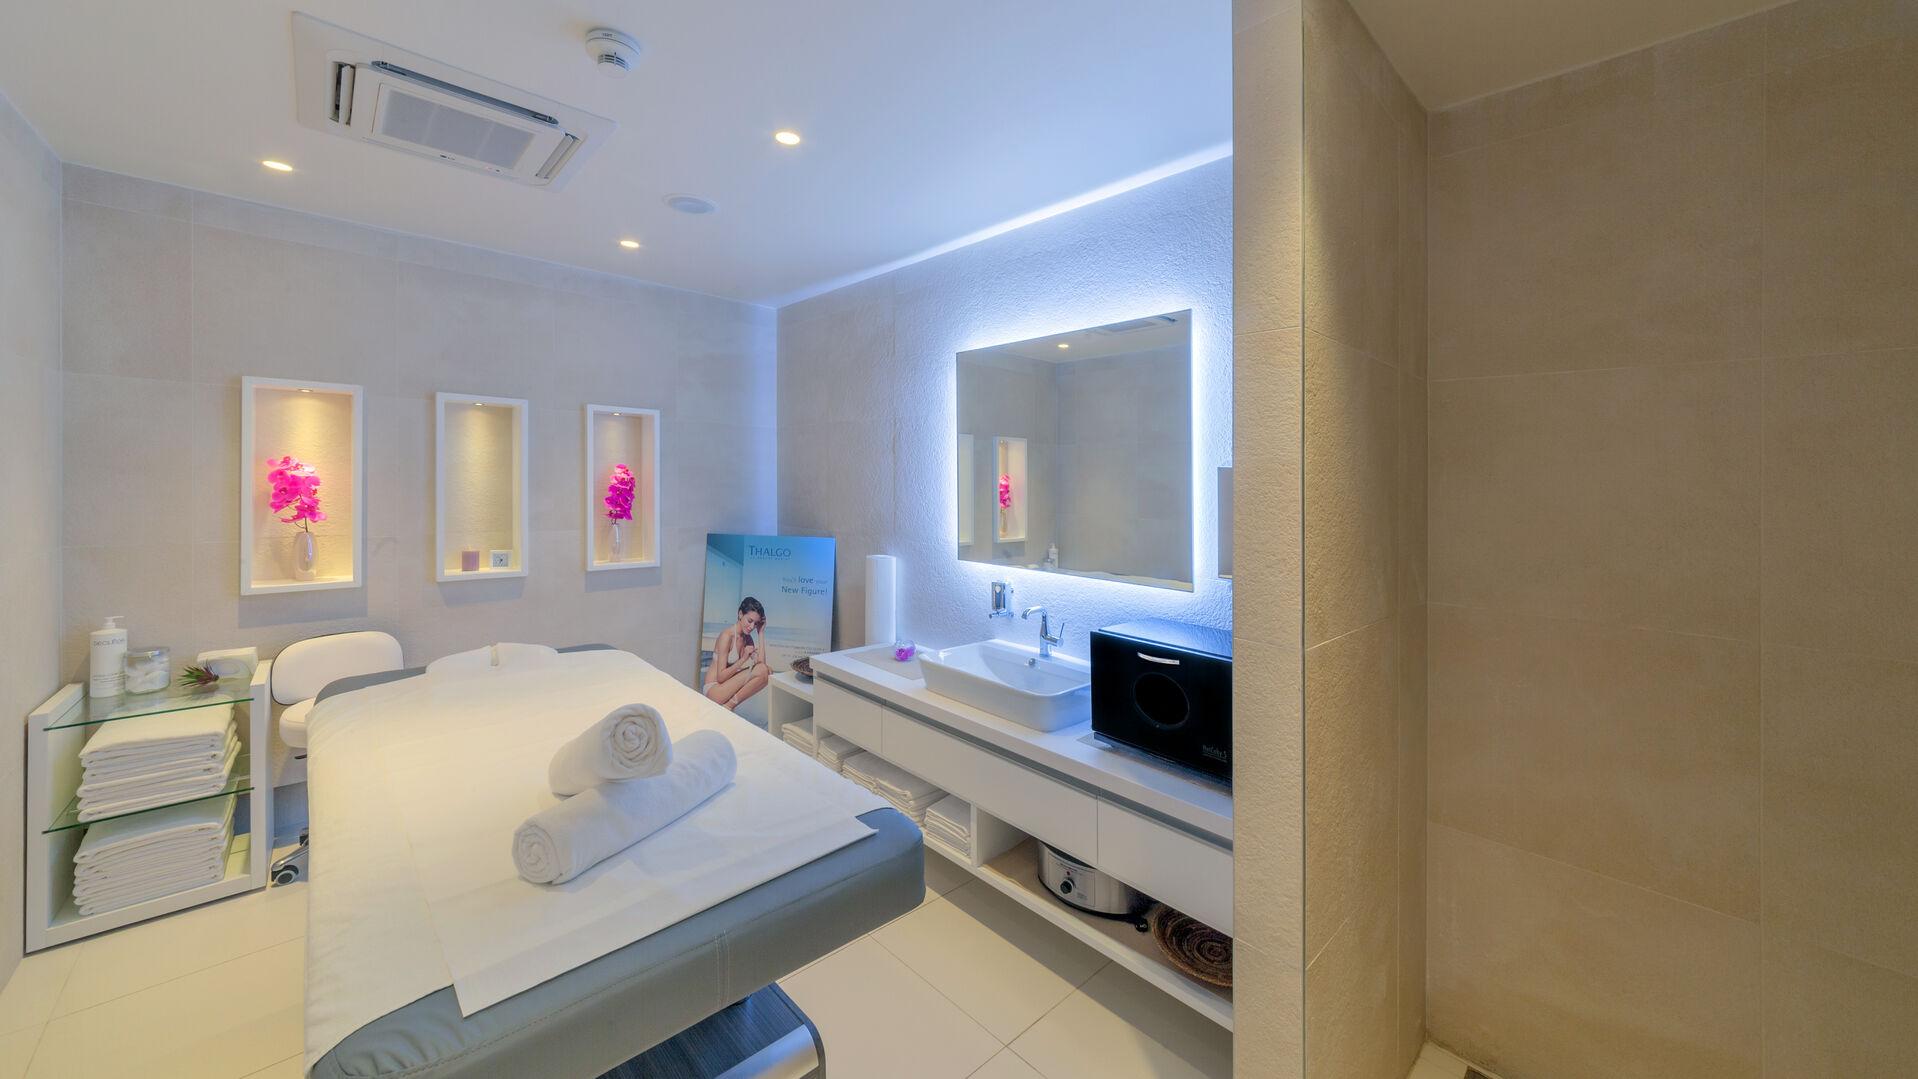 https://cms.satur.sk/data/imgs/tour_image/orig/bluesun_berulia_wellness-spa-treatment-room-1-1956658.jpg